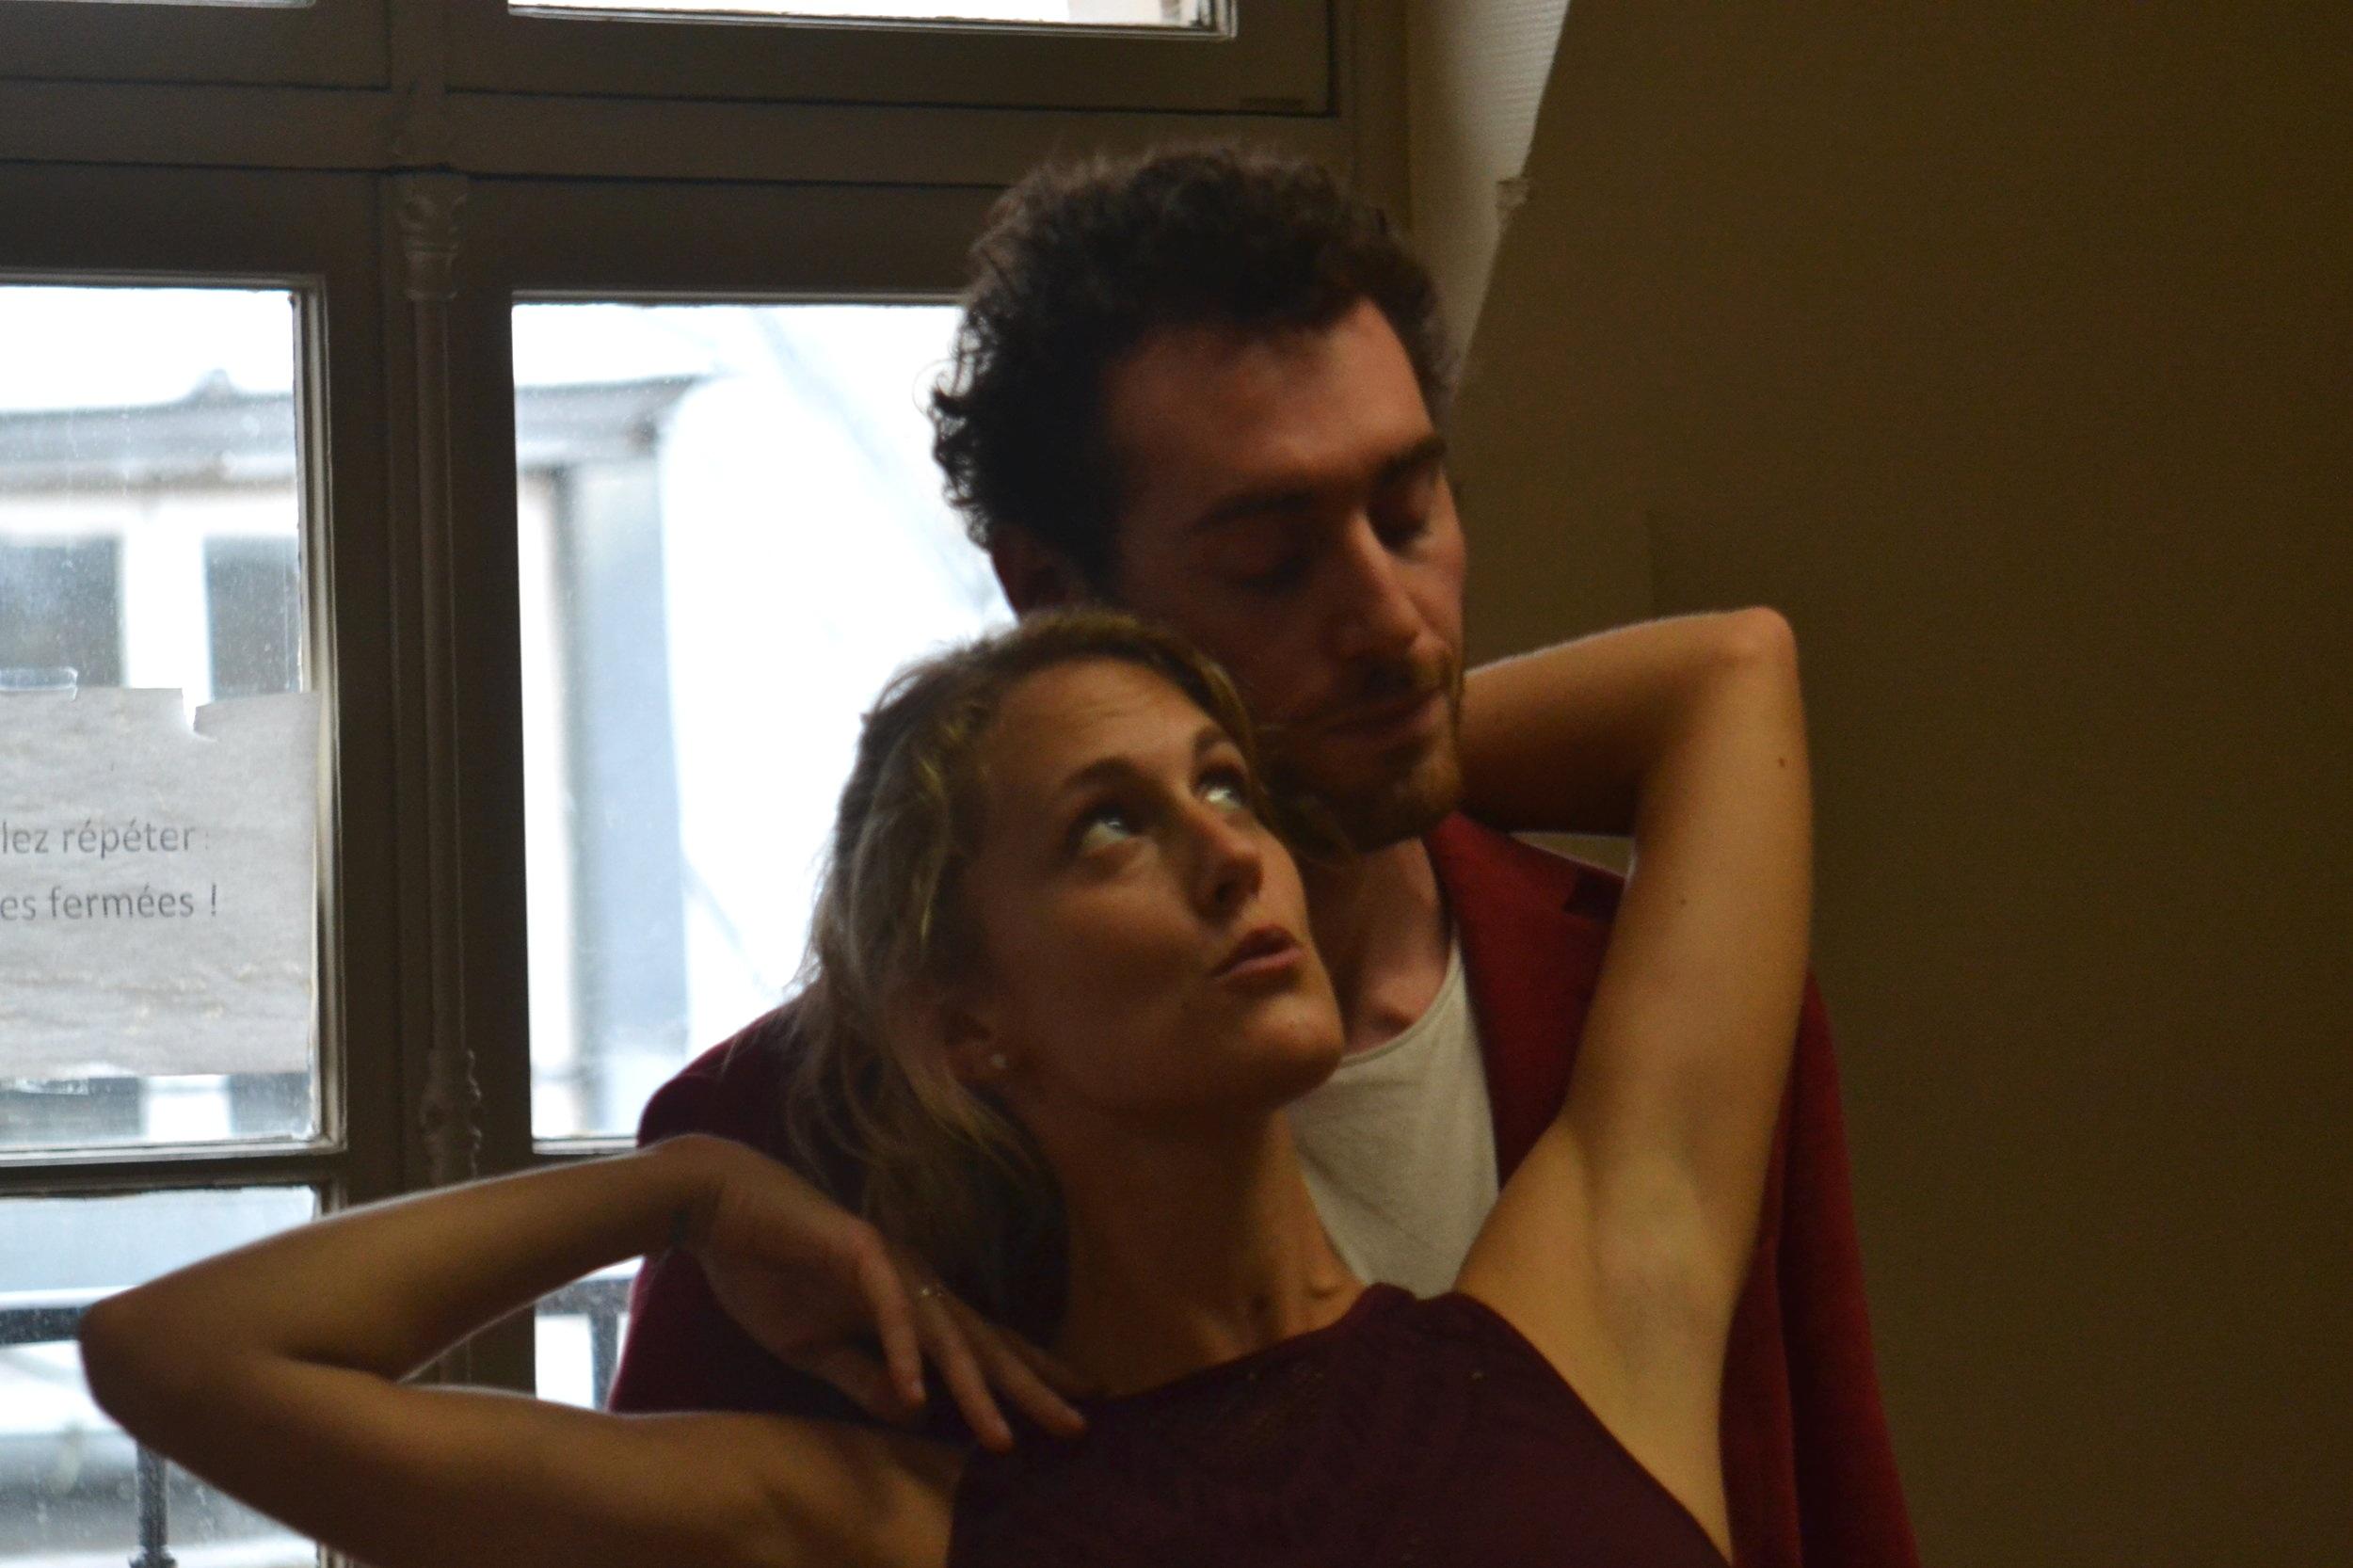 Emily Guernsey & Joshua Stretton rehearse the roles of Helena & Demetrius